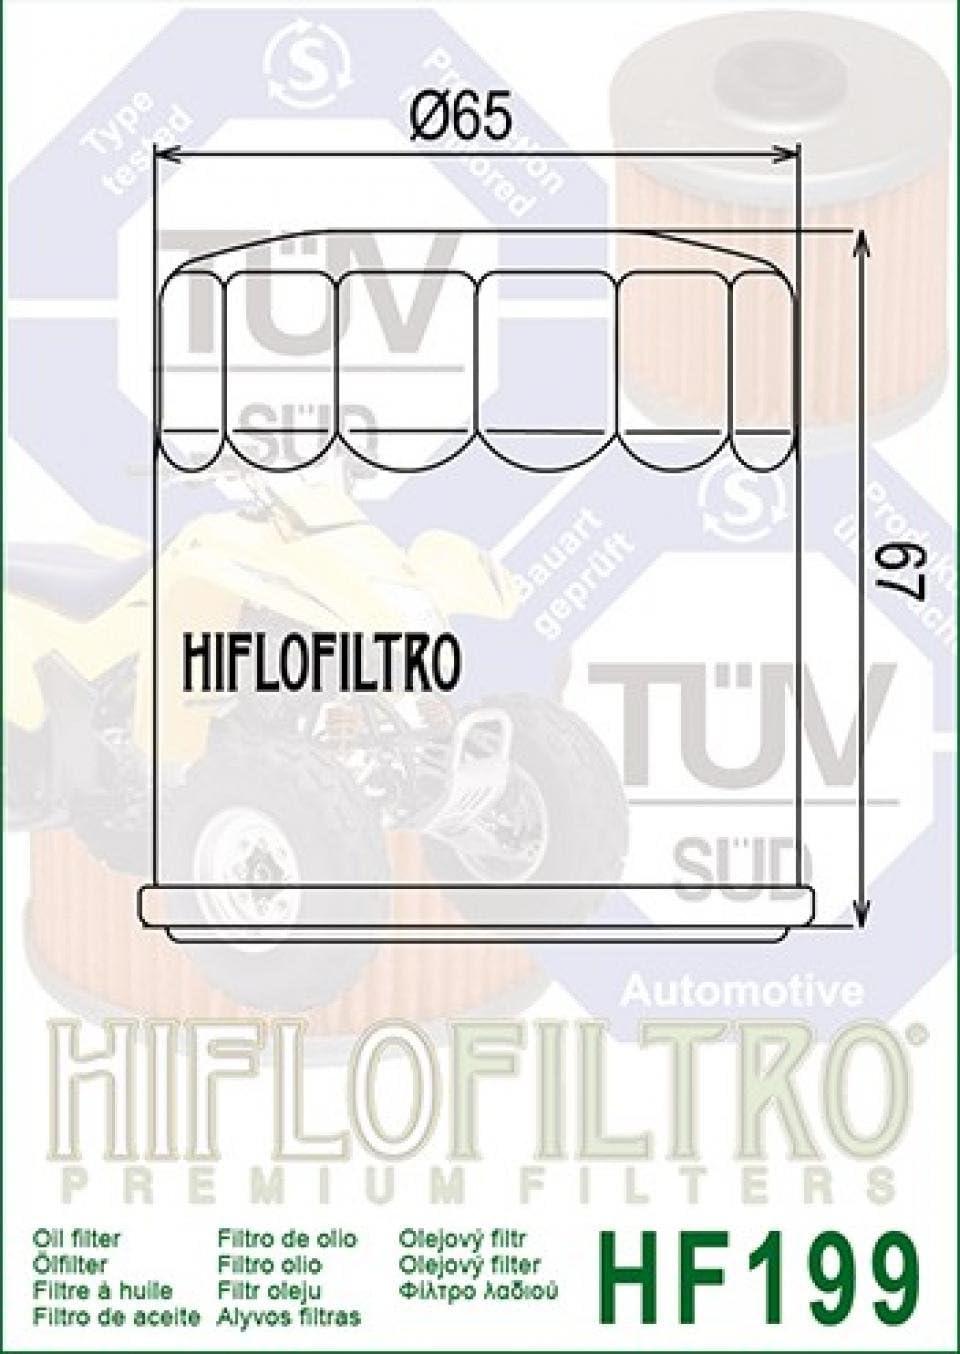 Filtre /à huile Hiflo Filtro pour Quad Polaris 850 Sportsman 2009-2015 HF199 2520799 Neuf